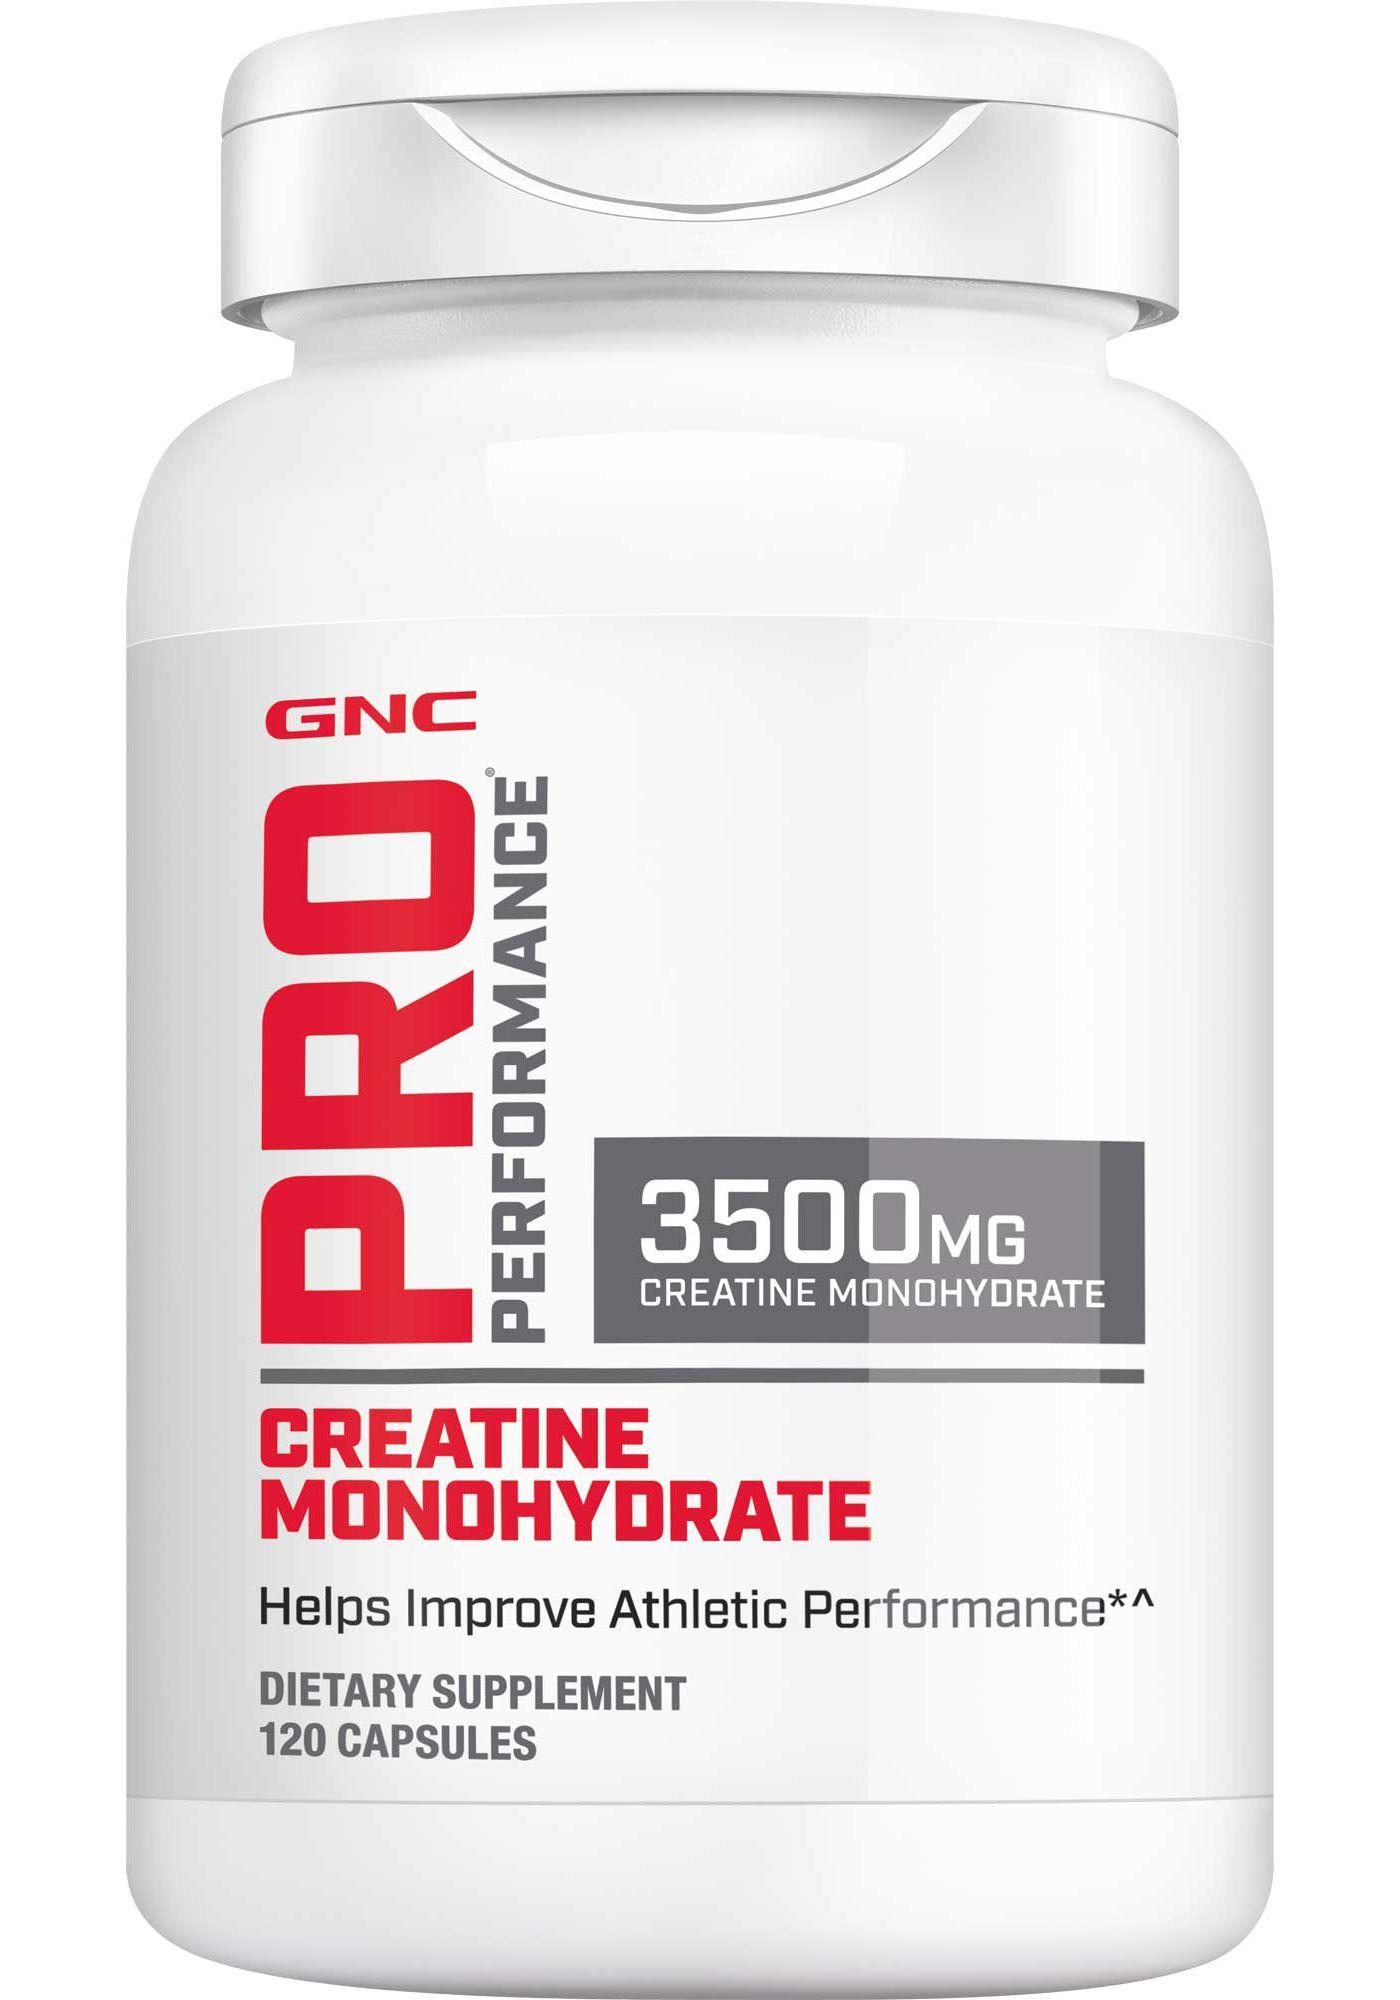 GNC Pro Performance Creatine Monohydrate 3500mg 120 Capsules